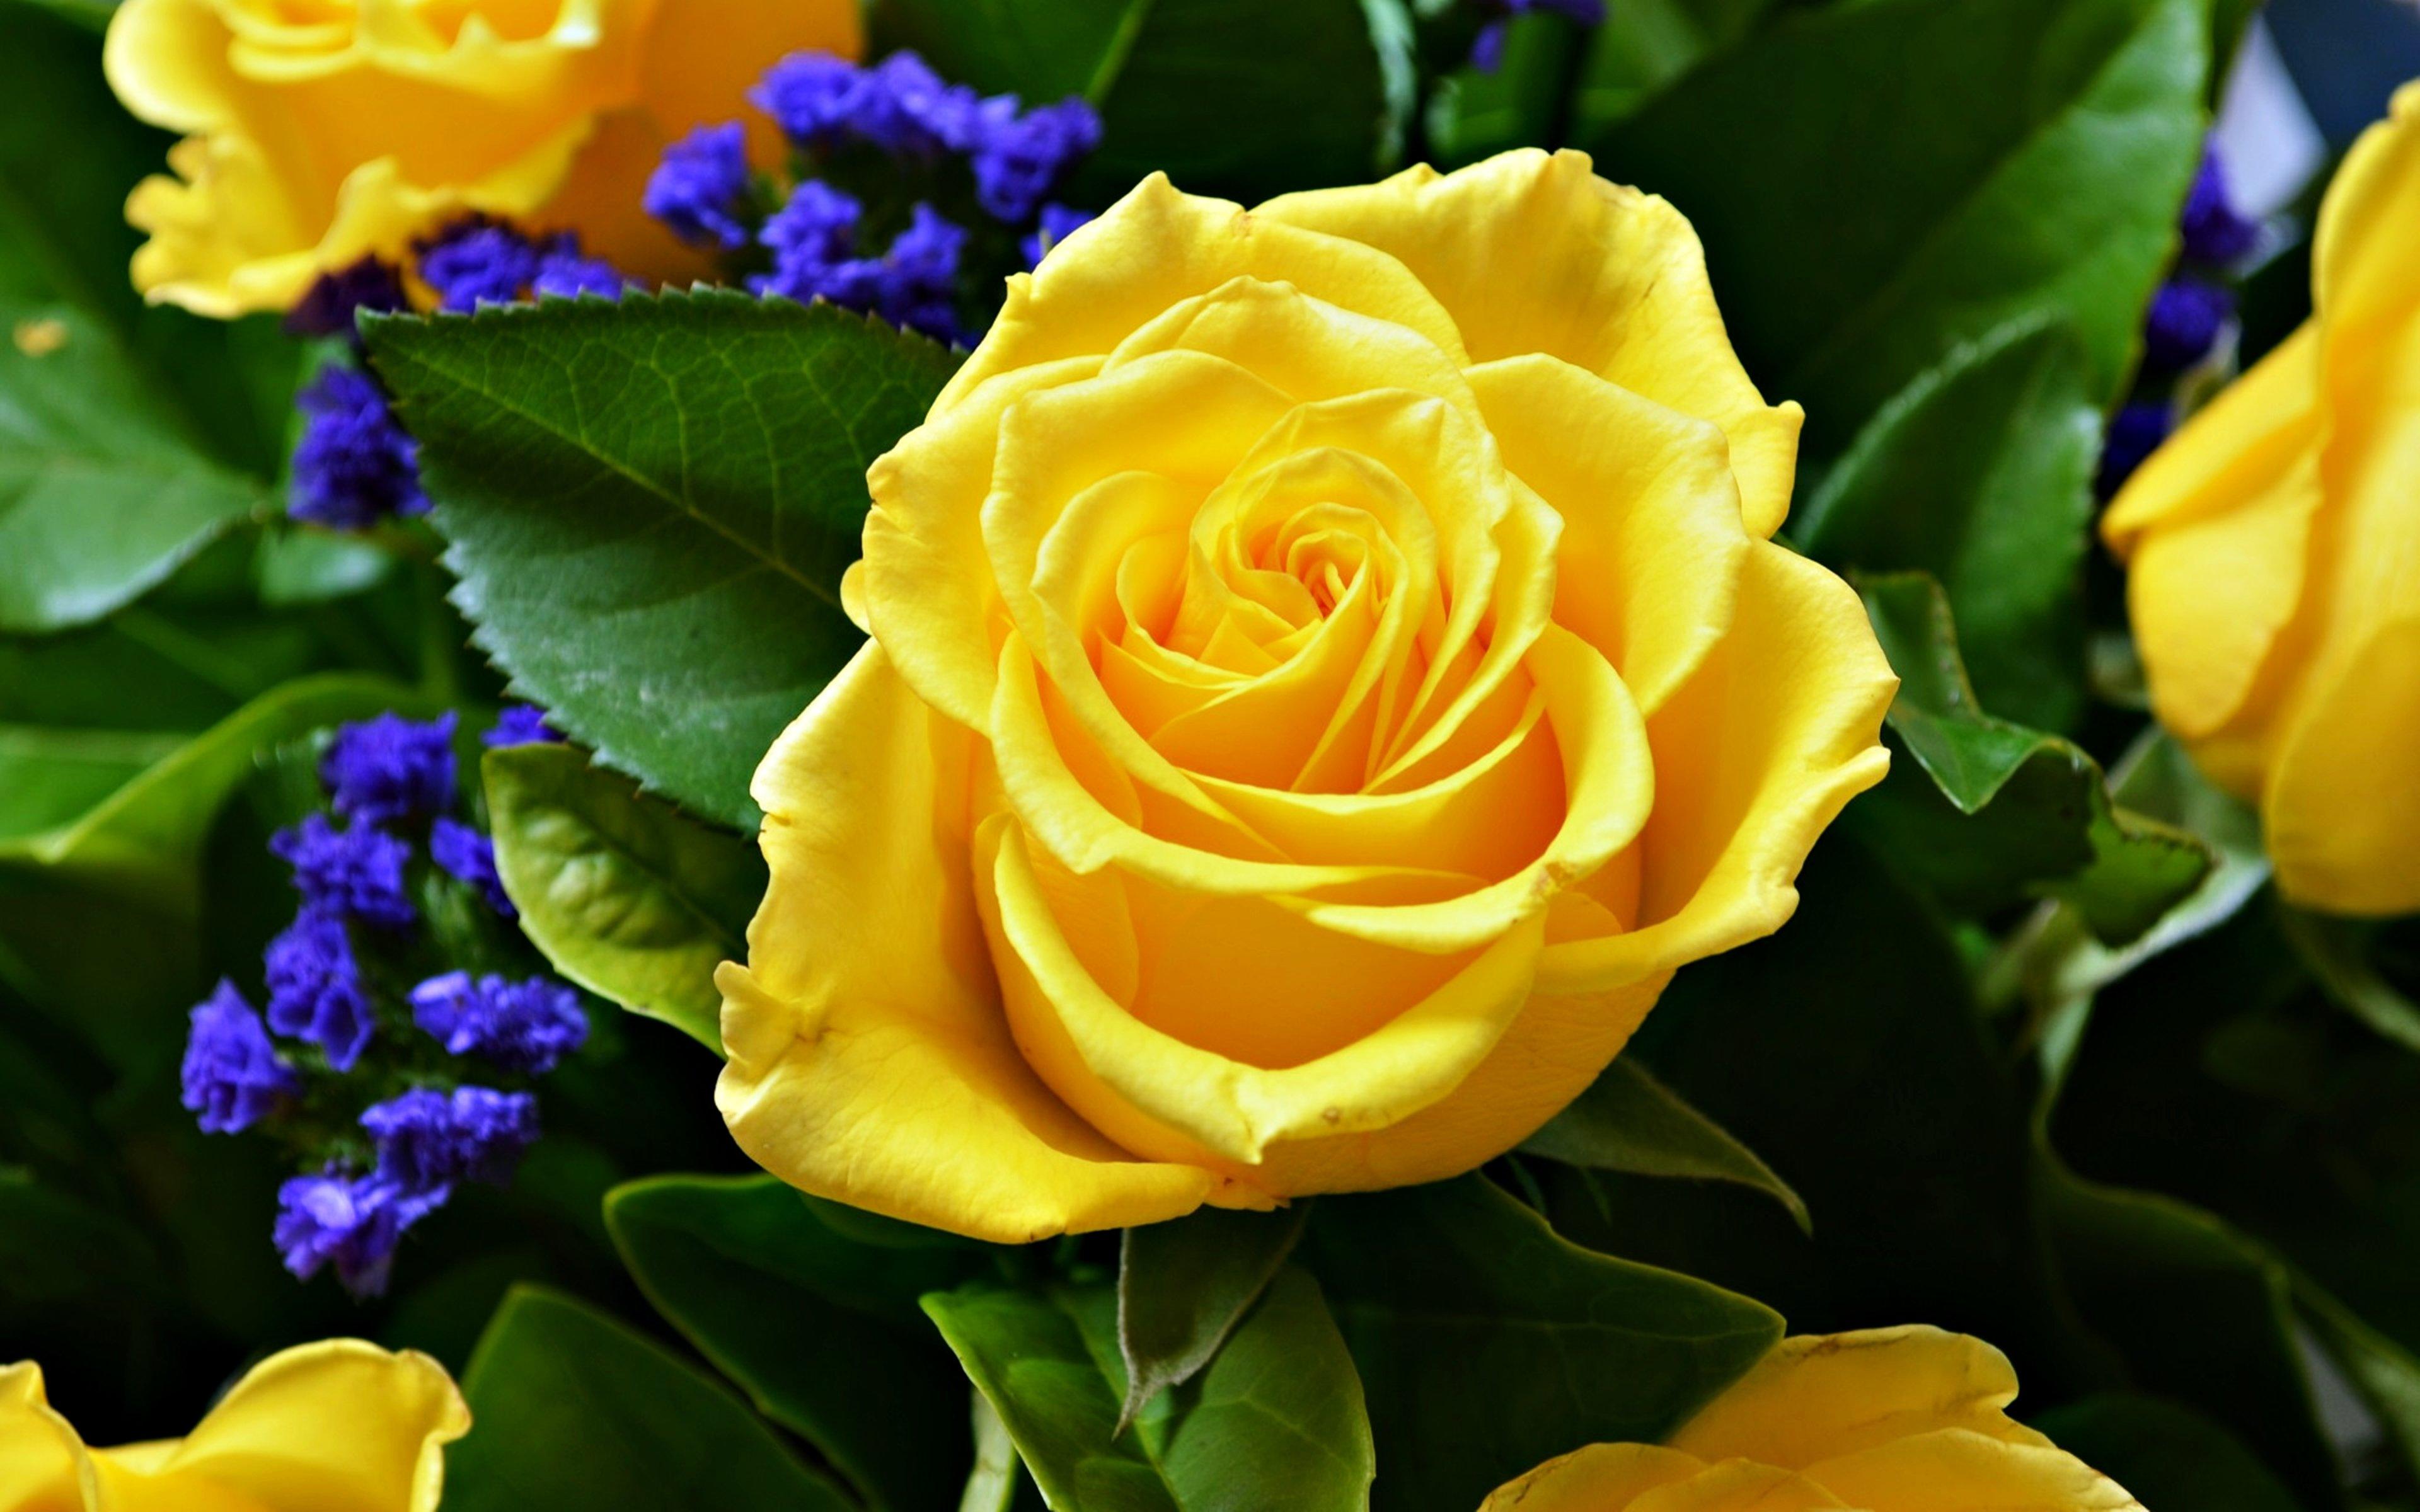 Wallpaper 3840x2400 Px Flower Life Love Rose Yellow